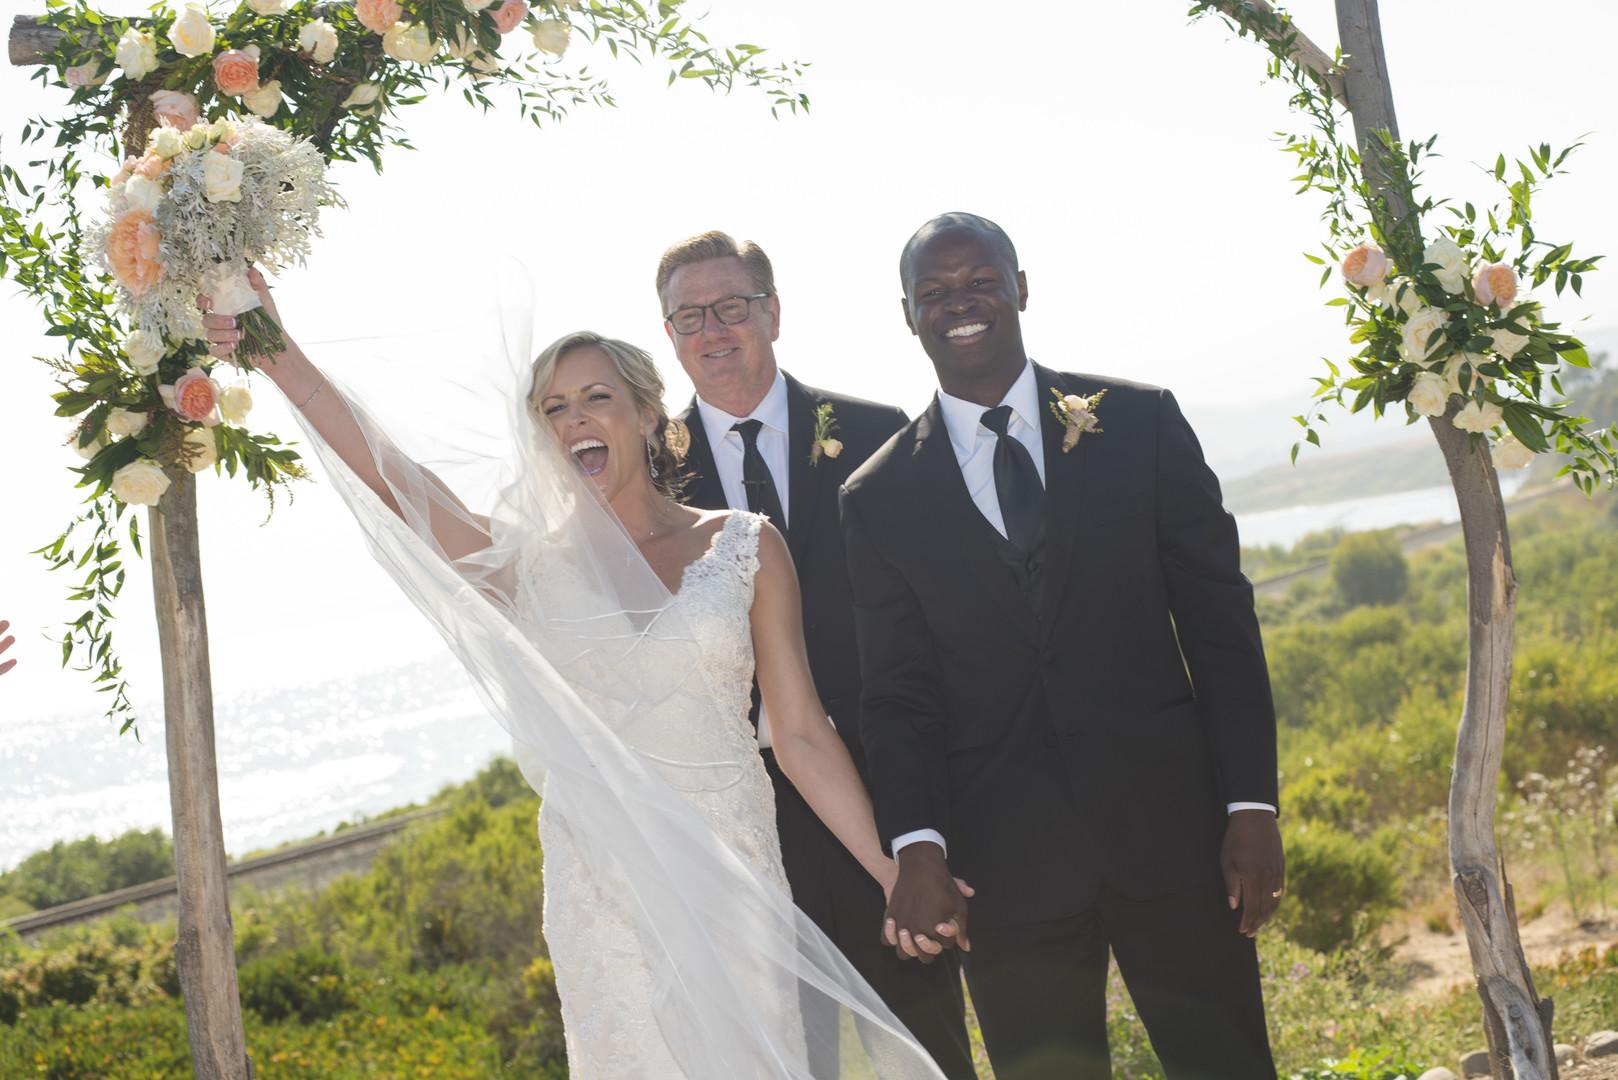 www.santabarbarawedding.com | Venue: Dos Pueblos Ranch | Photographer: ByCherry Photography | Event Designer: Elan Event Rentals | Florist: Tyler Speier | Wedding Ceremony - After the Vows